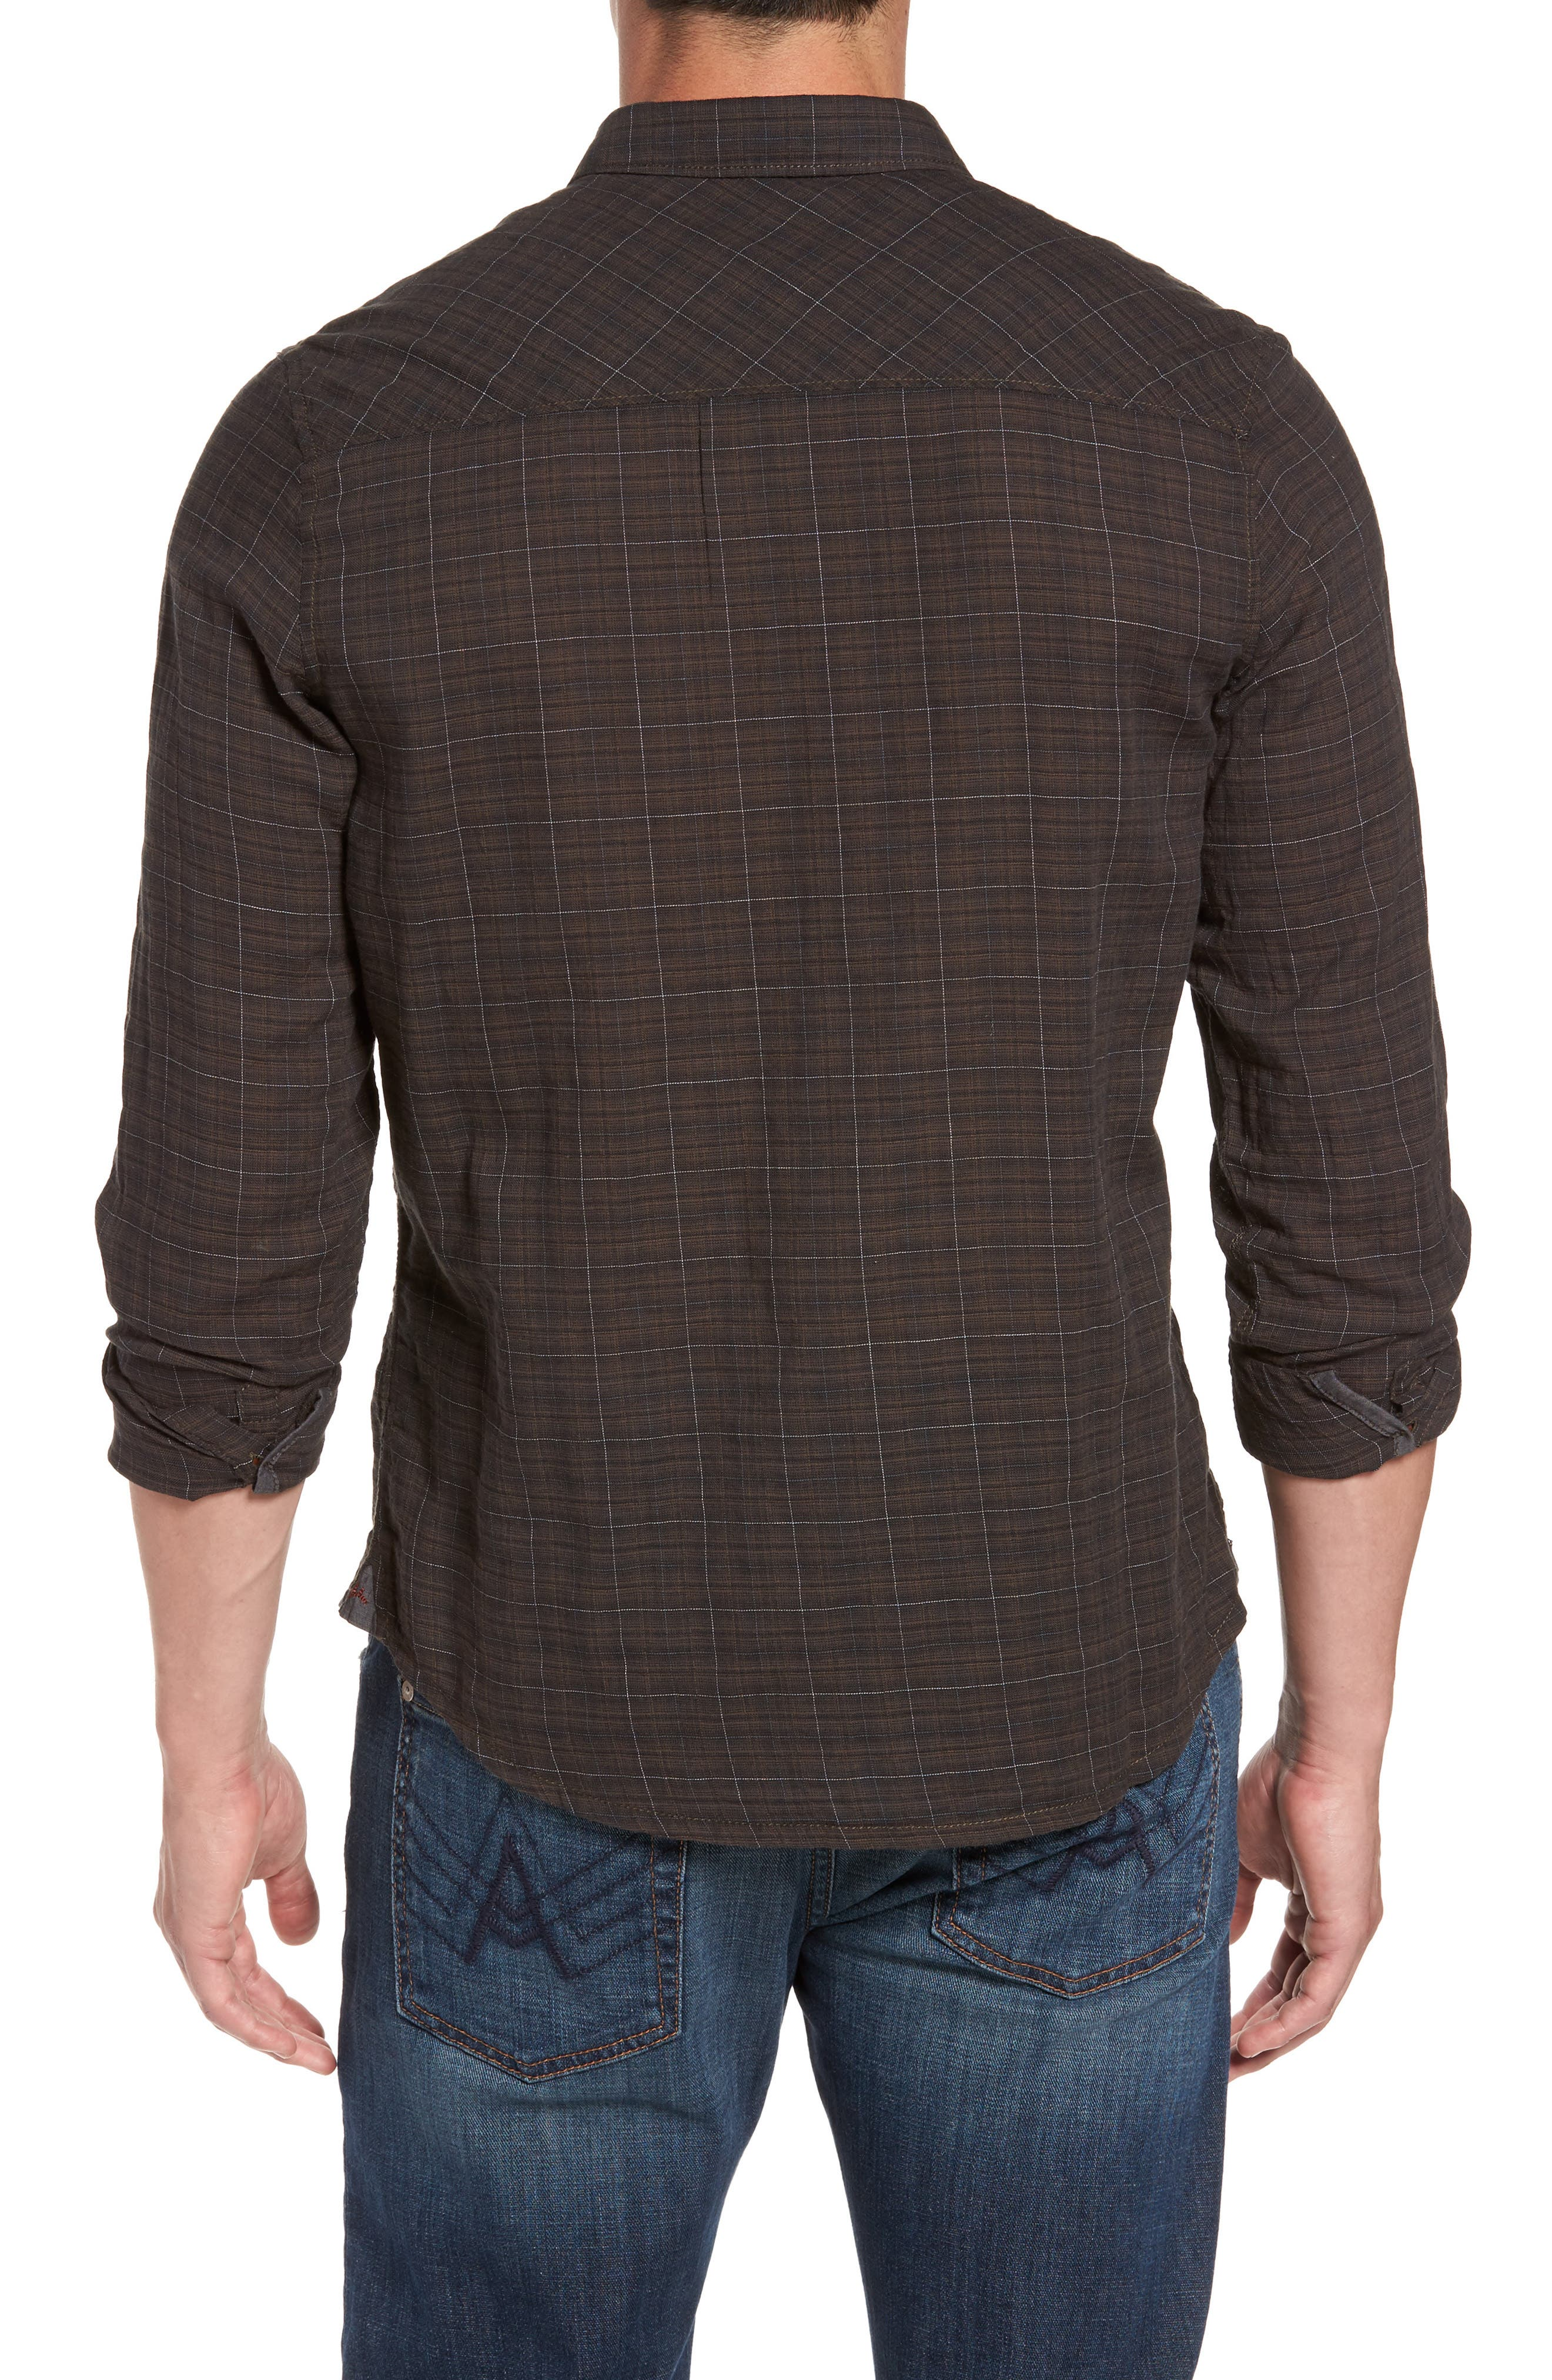 Molera Pucker Plaid Sport Shirt,                             Alternate thumbnail 2, color,                             Asphalt